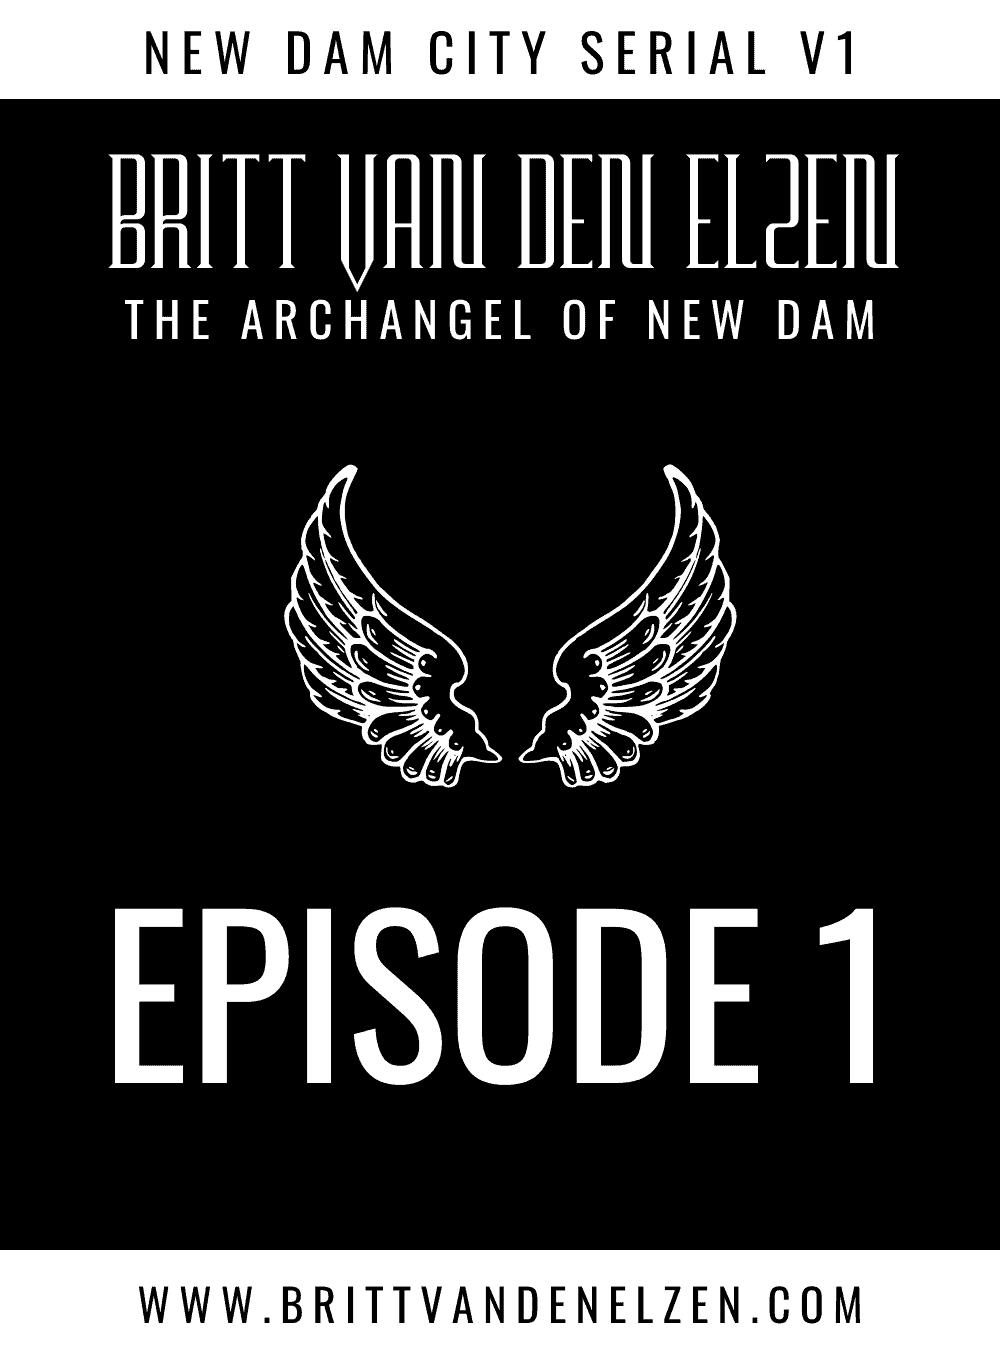 The Archangel of New Dam: Episode 1